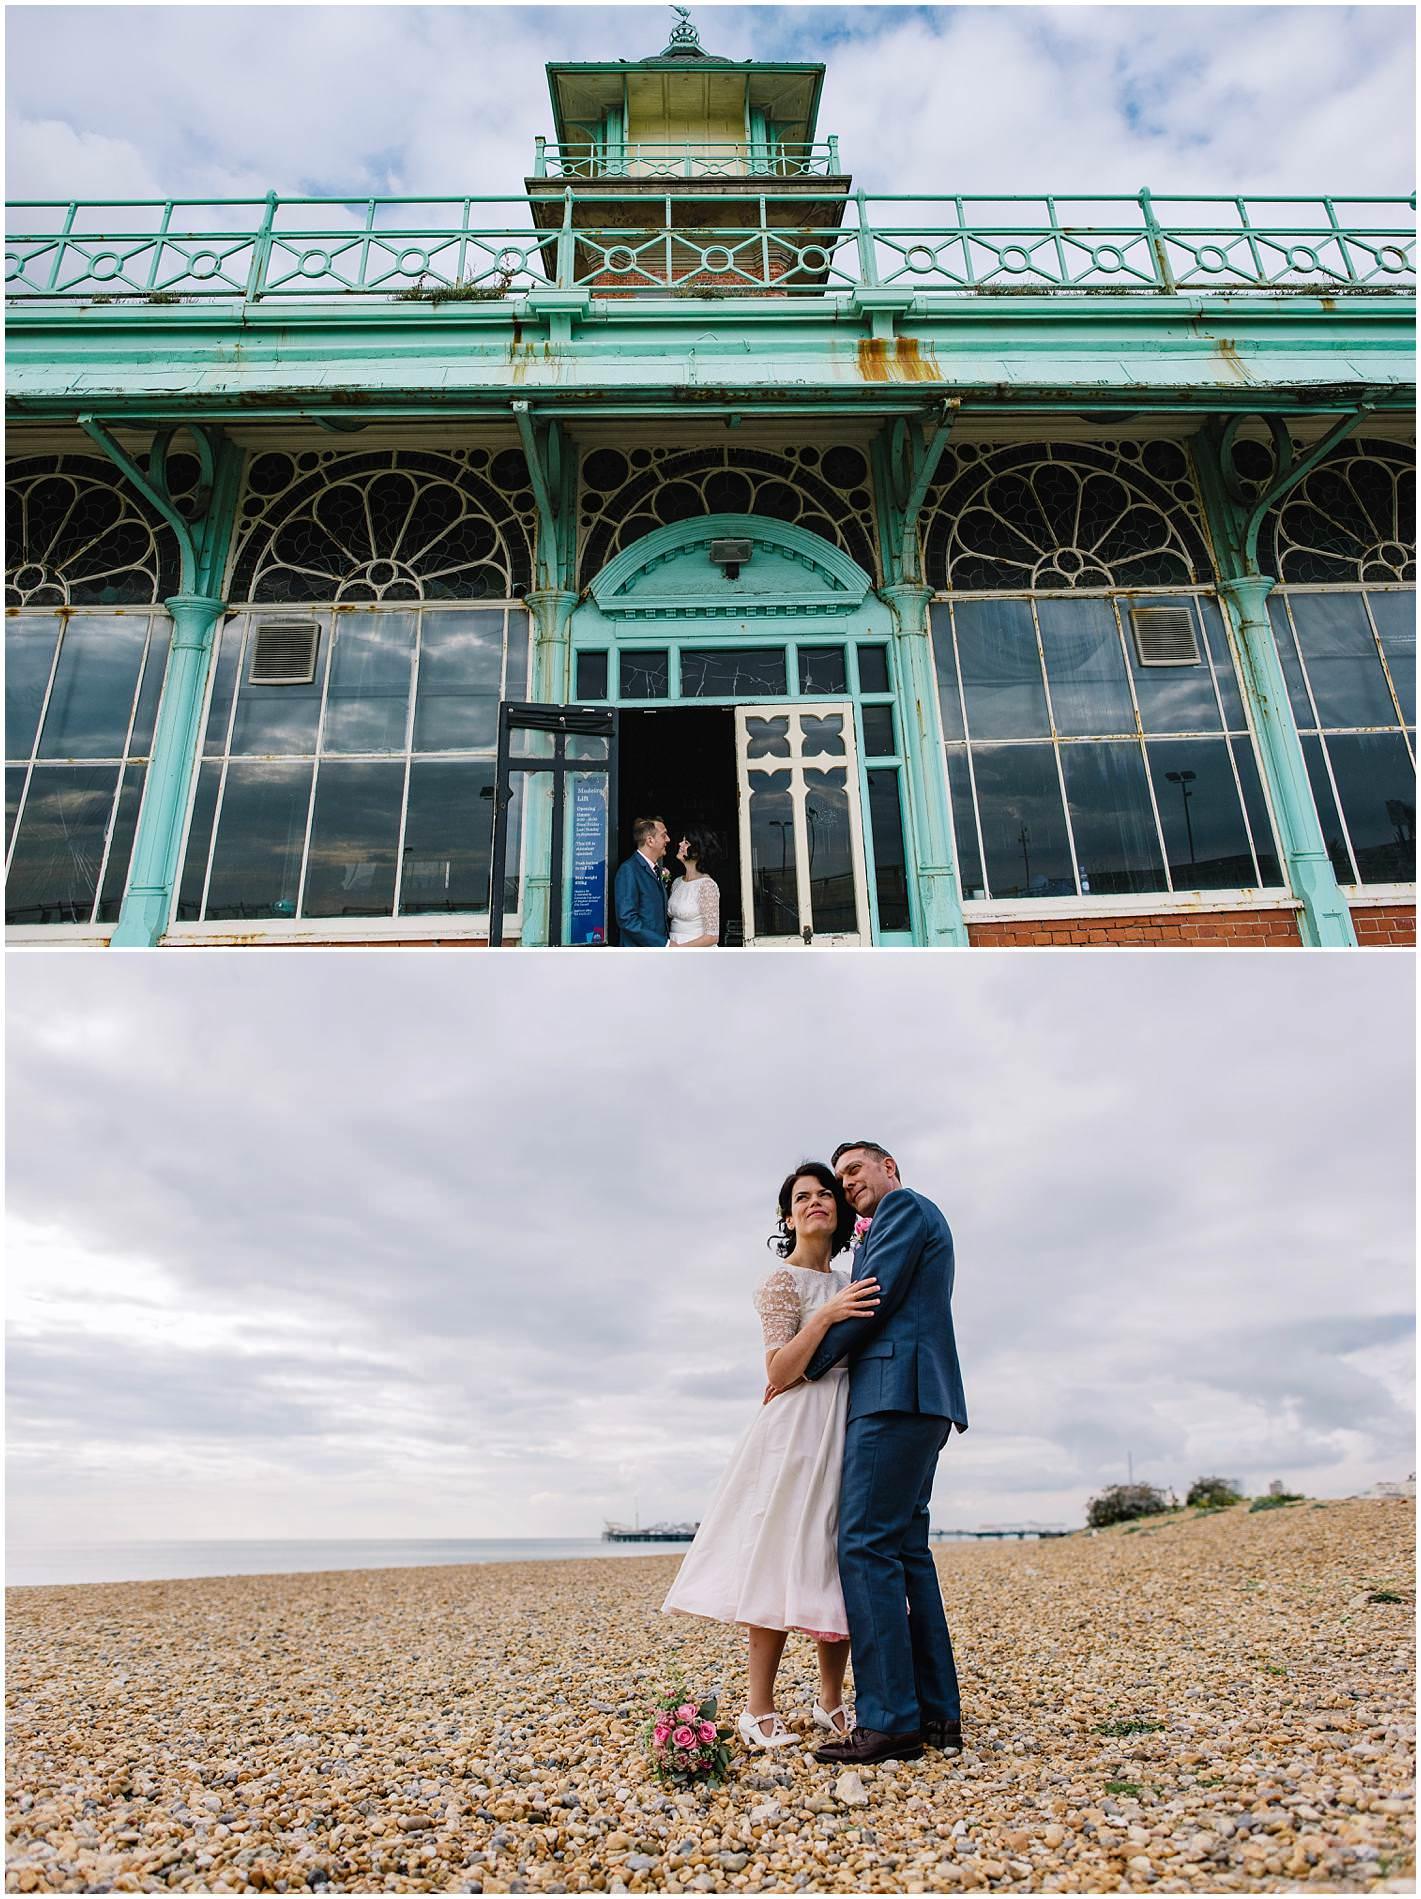 royal-pavilion-wedding-brighton404